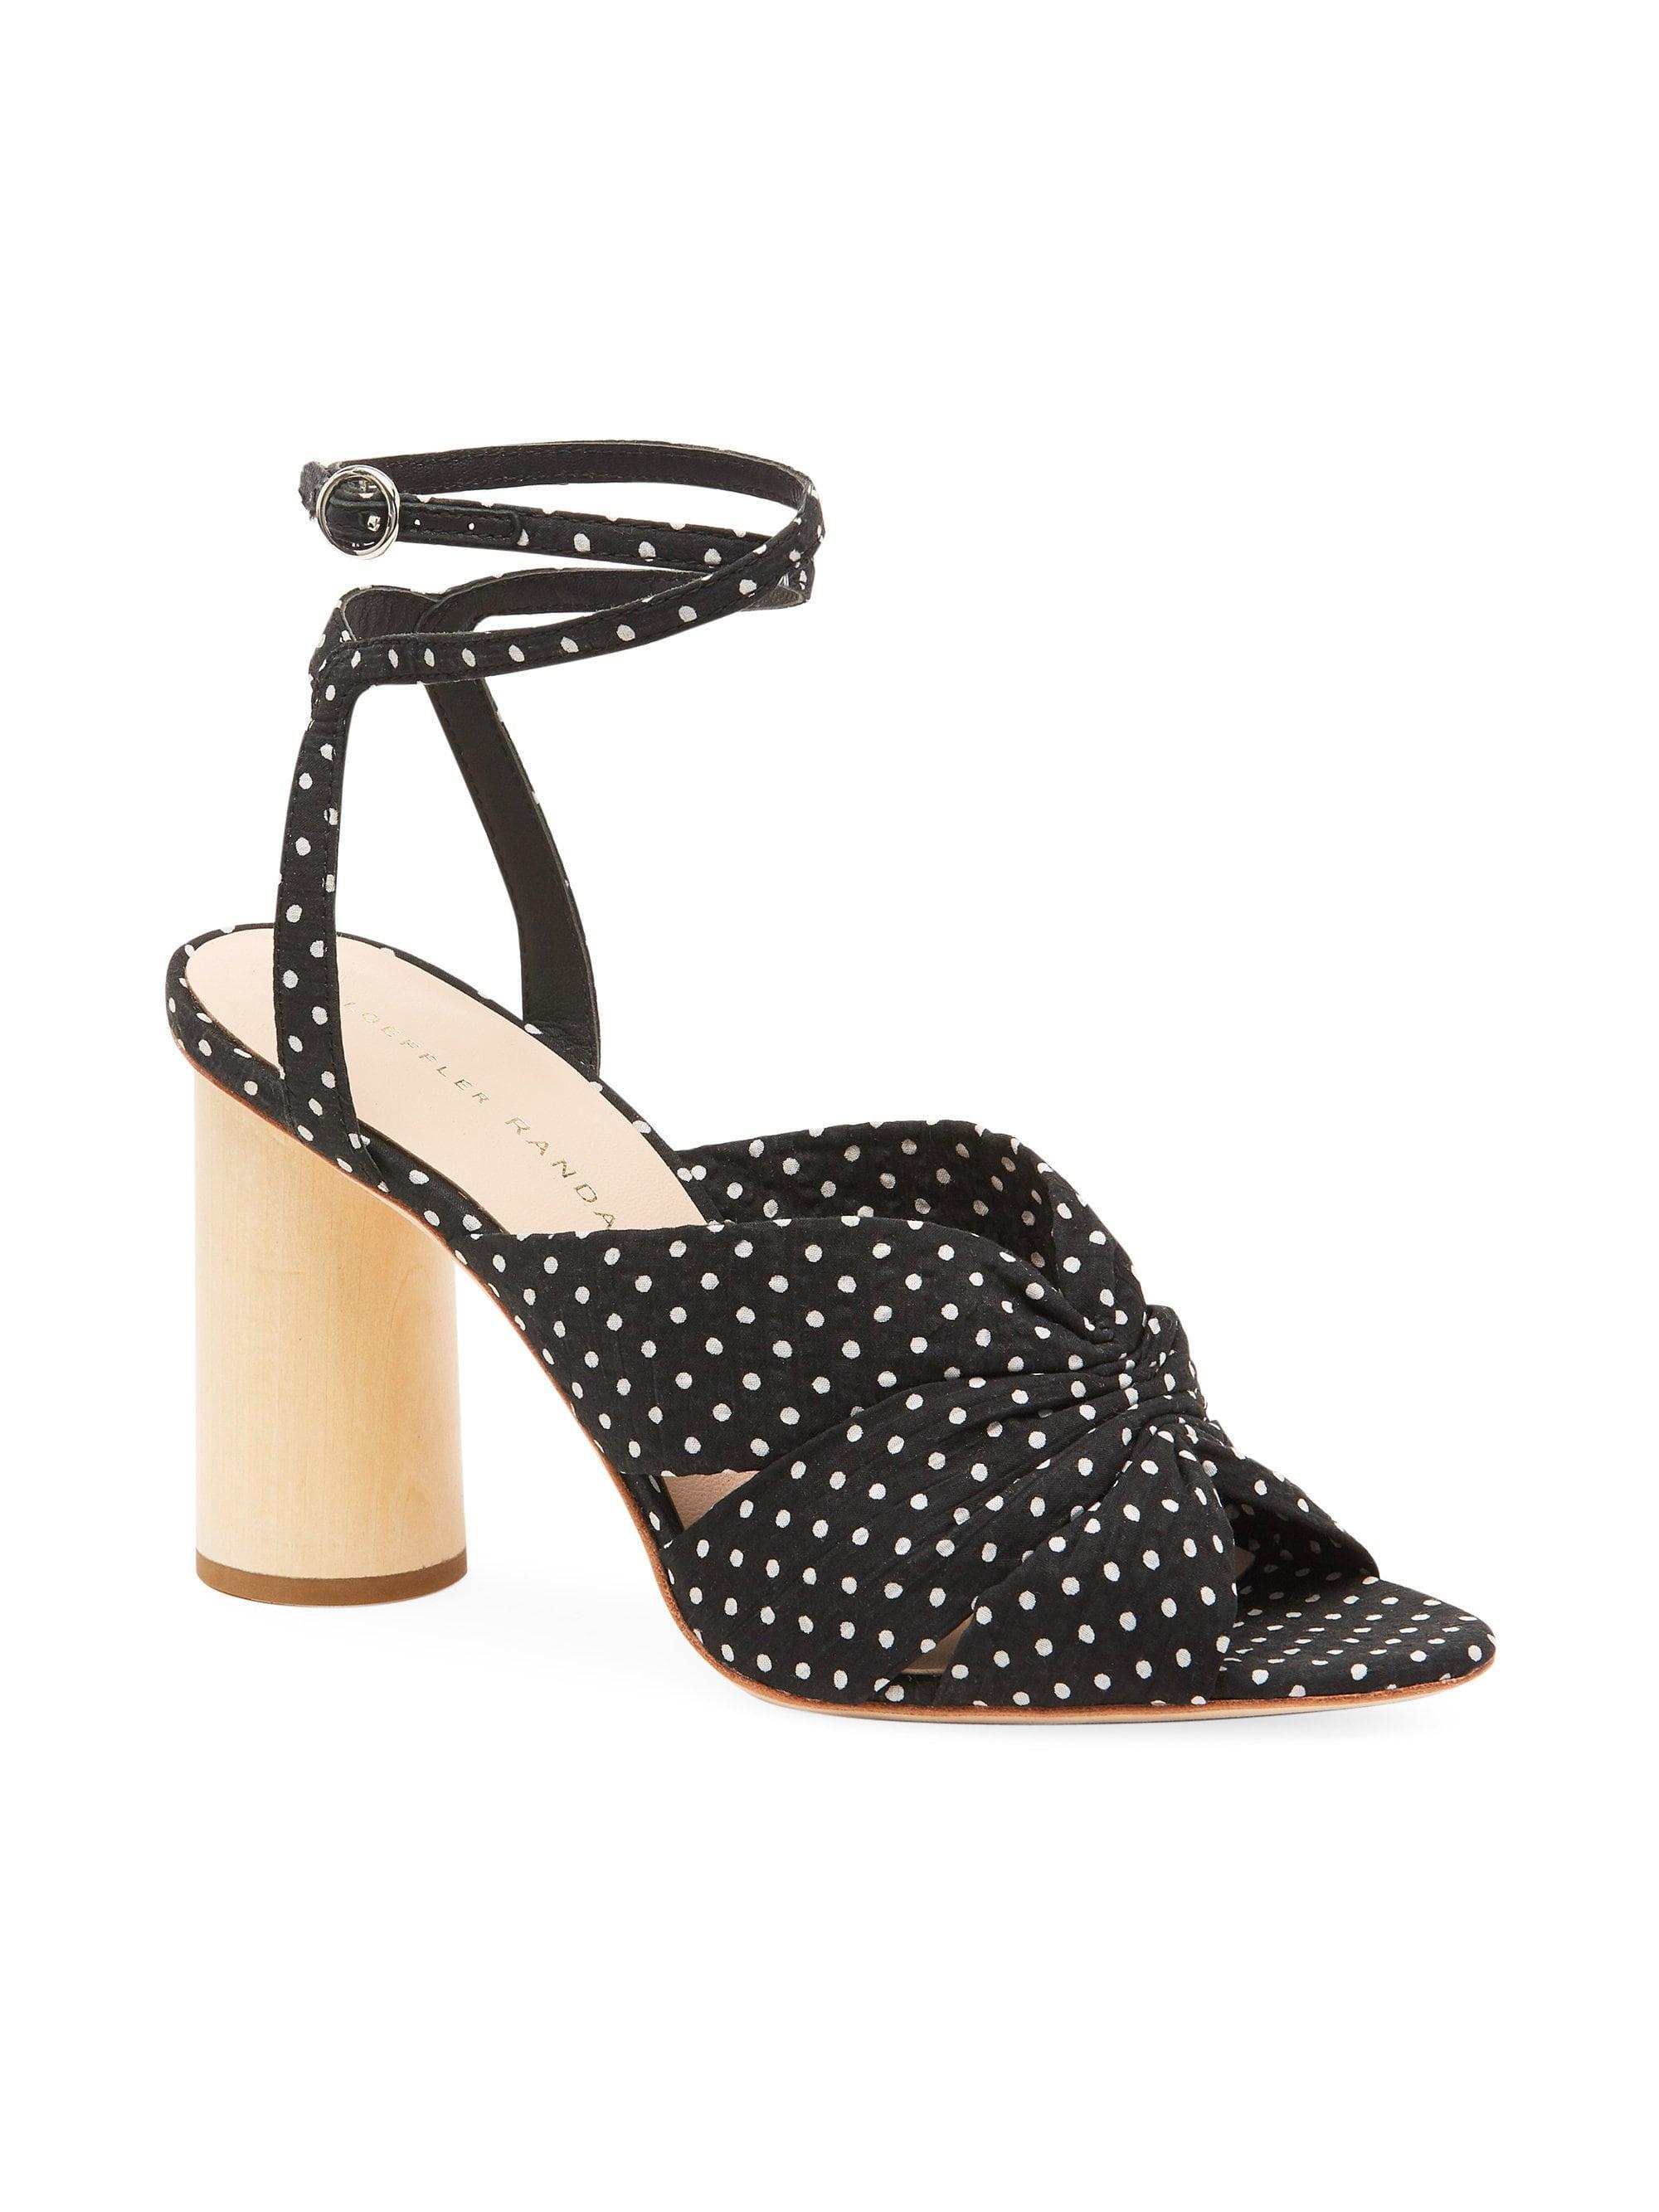 6caf77933621 Lyst - Loeffler Randall Tatiana Ankle-strap Cinched Sandals in Black